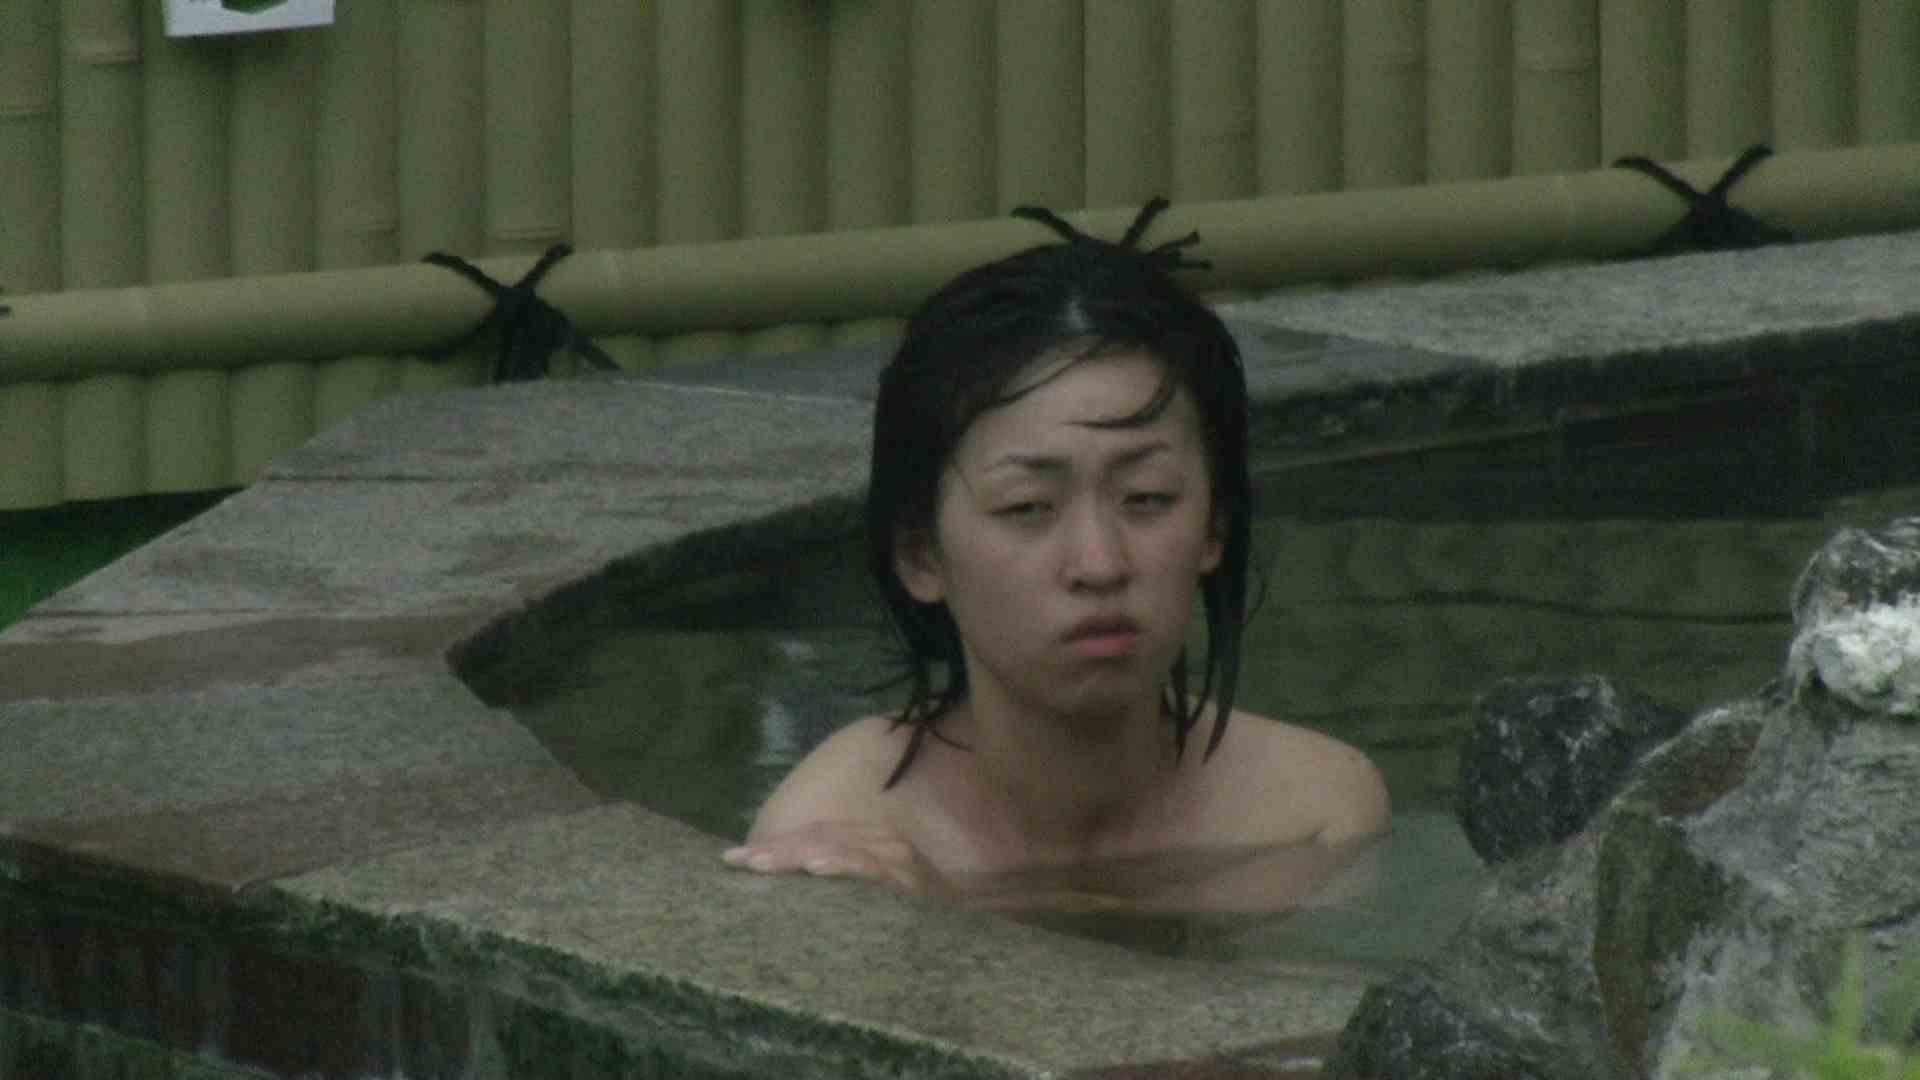 Aquaな露天風呂Vol.170 盗撮   OLセックス  54画像 31